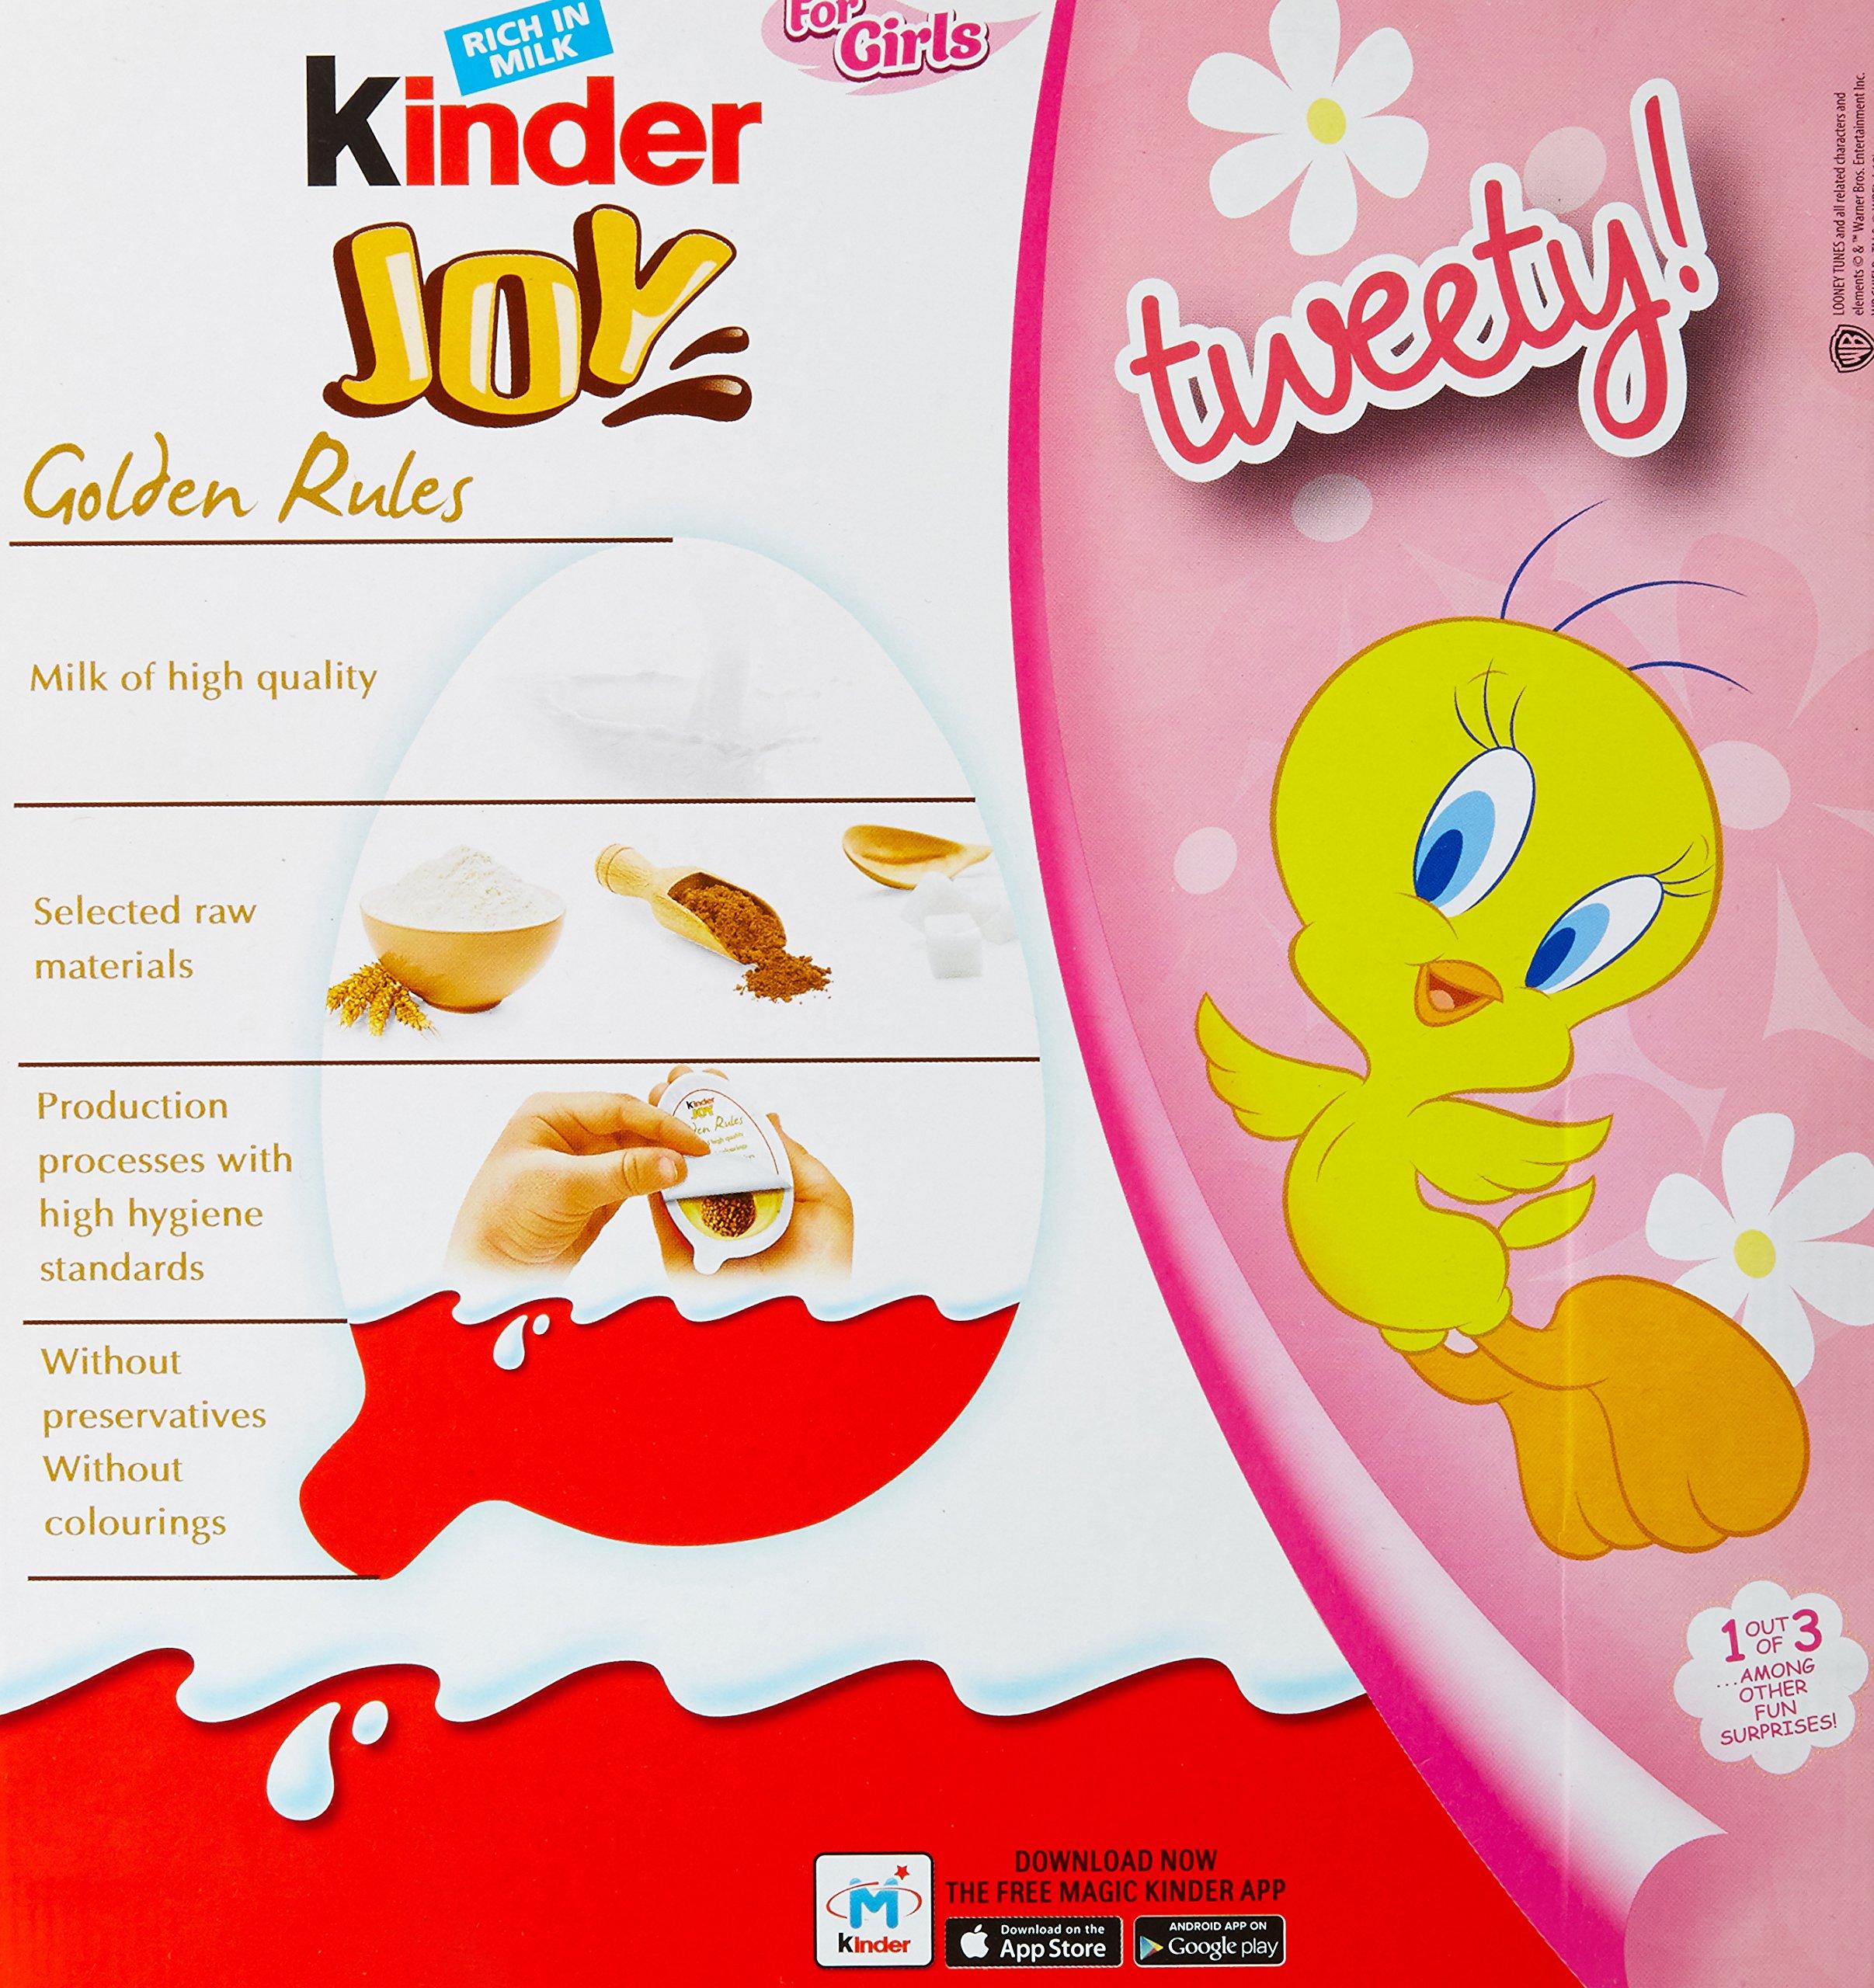 Kinder Joy Chocolates For Girls, 24 Pieces